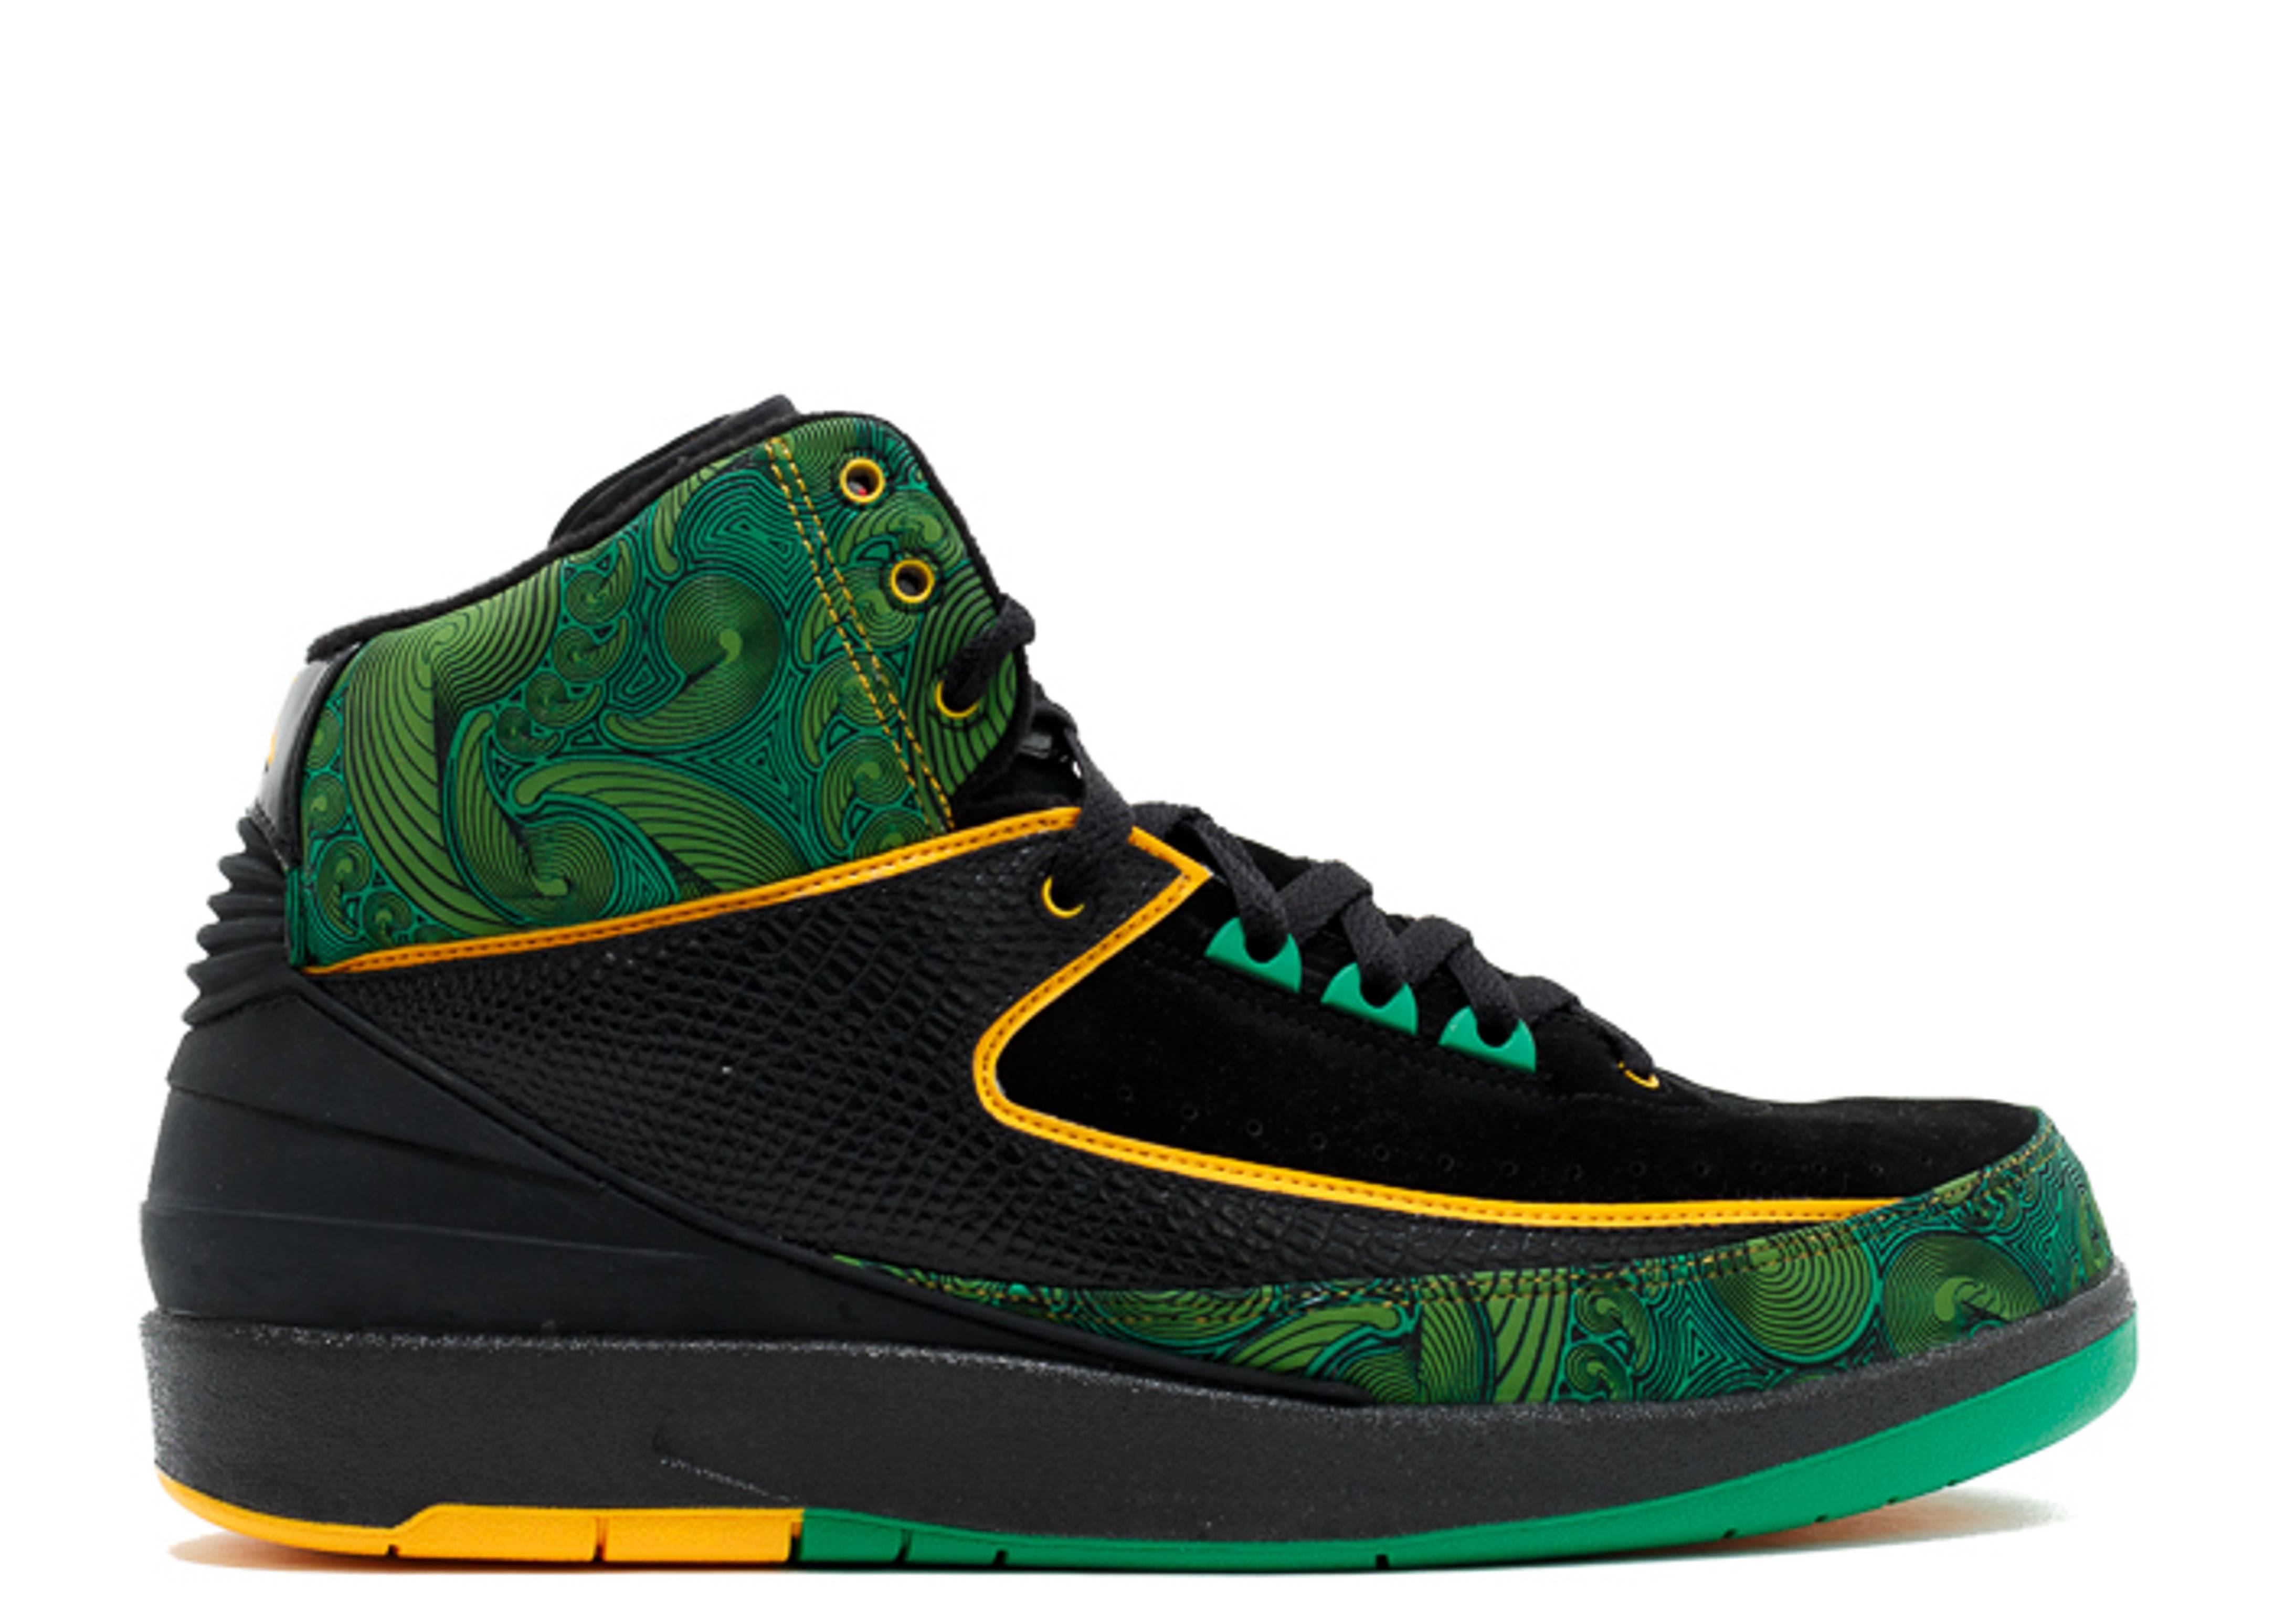 new products f11f3 9cc7c ... Nike Air Jordan III Retro DB Doernbecher - 2013 (by nirmax) Air Jordan  2 High Db ...